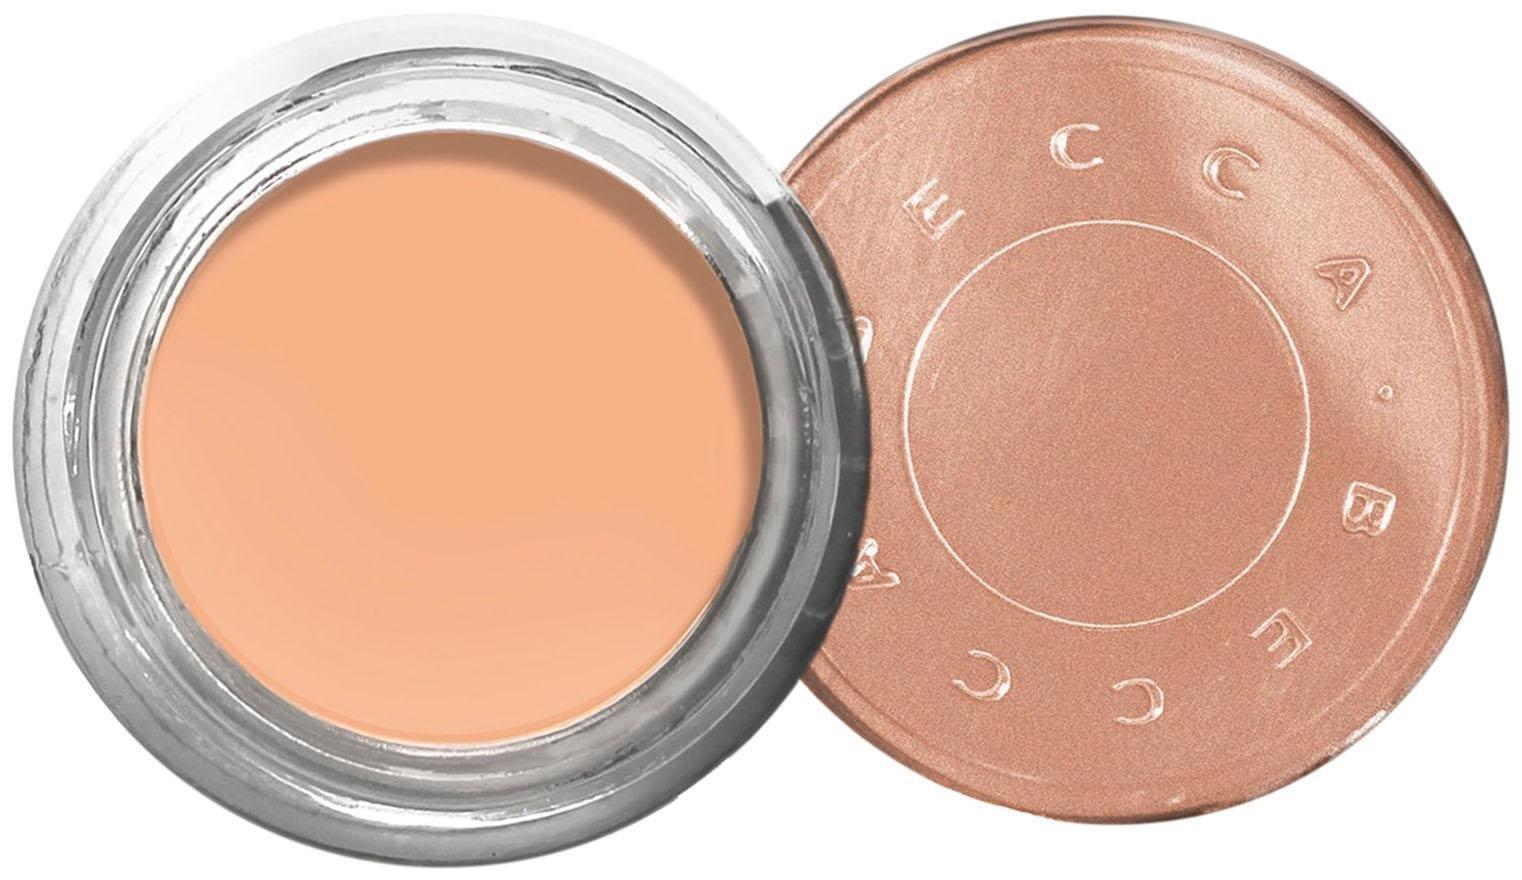 BECCA – Under Eye Brightening Corrector, Light to Medium: Pearlized, peachy-pink, 0.16 oz.